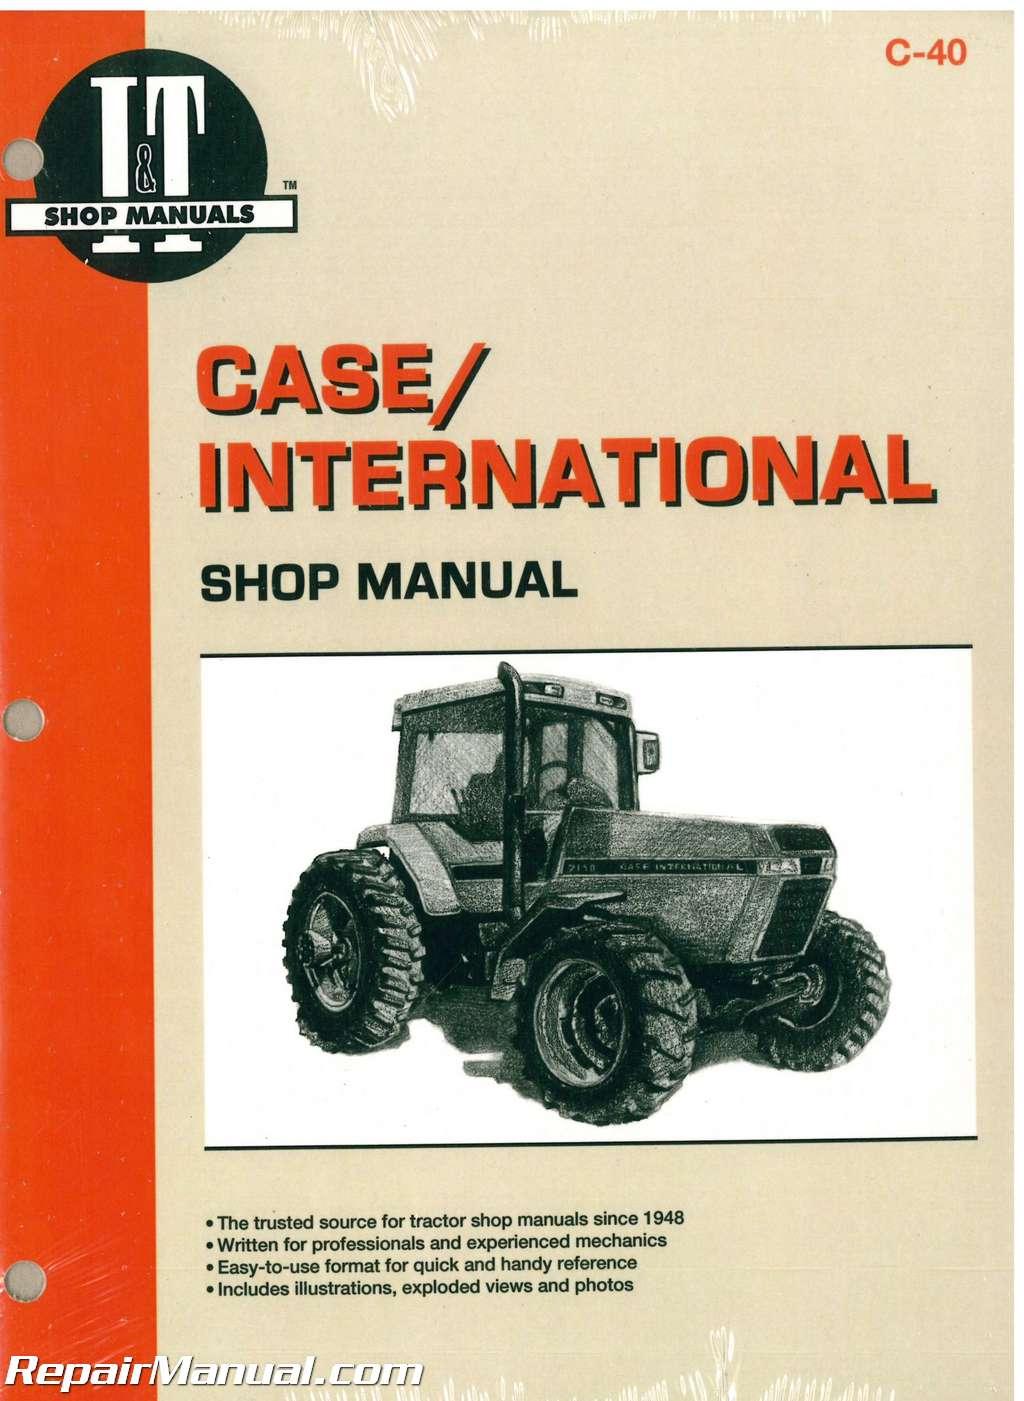 case international 7110 7120 7130 7140 tractor workshop manualCase International 7110 Wiring Diagrams #1